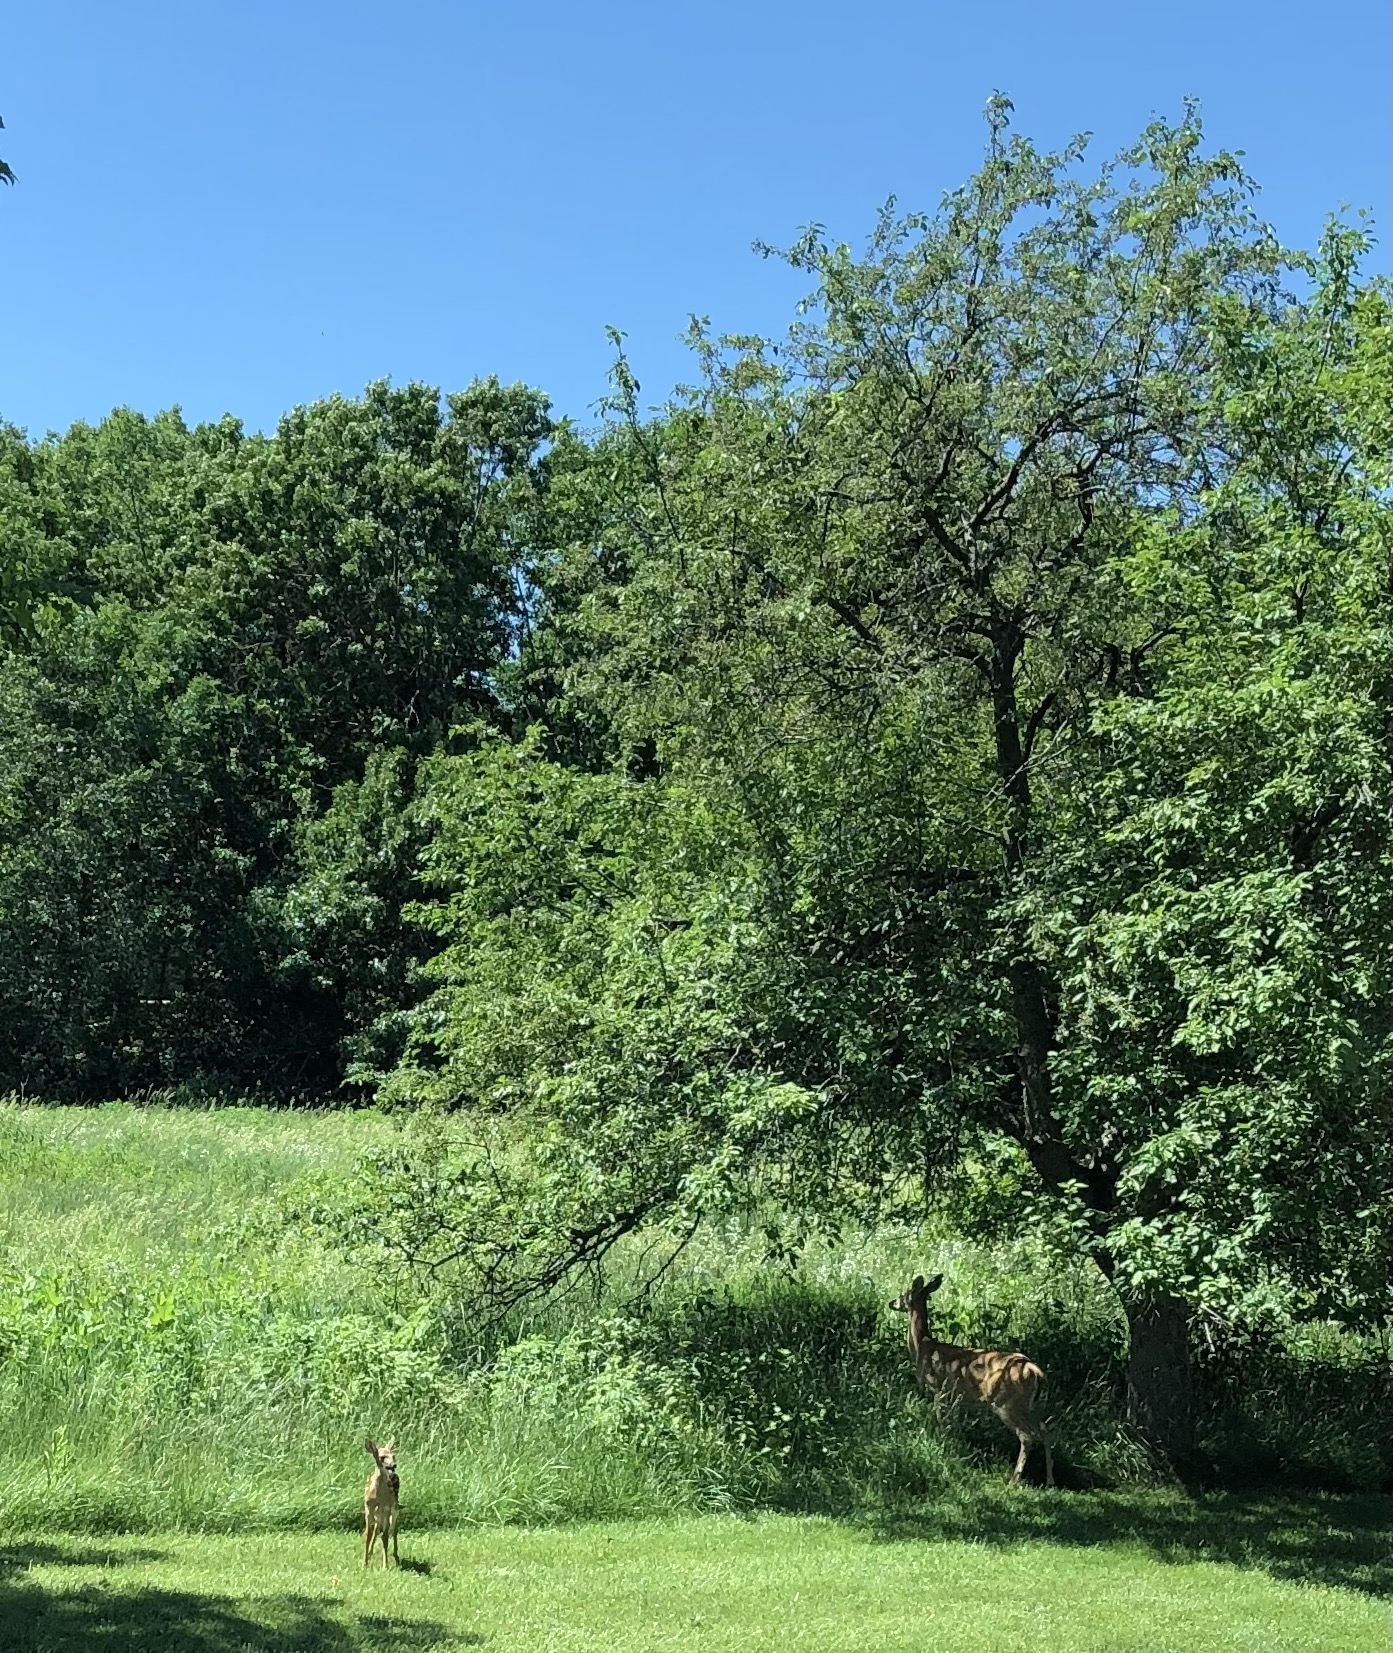 Mama and baby deer 0621